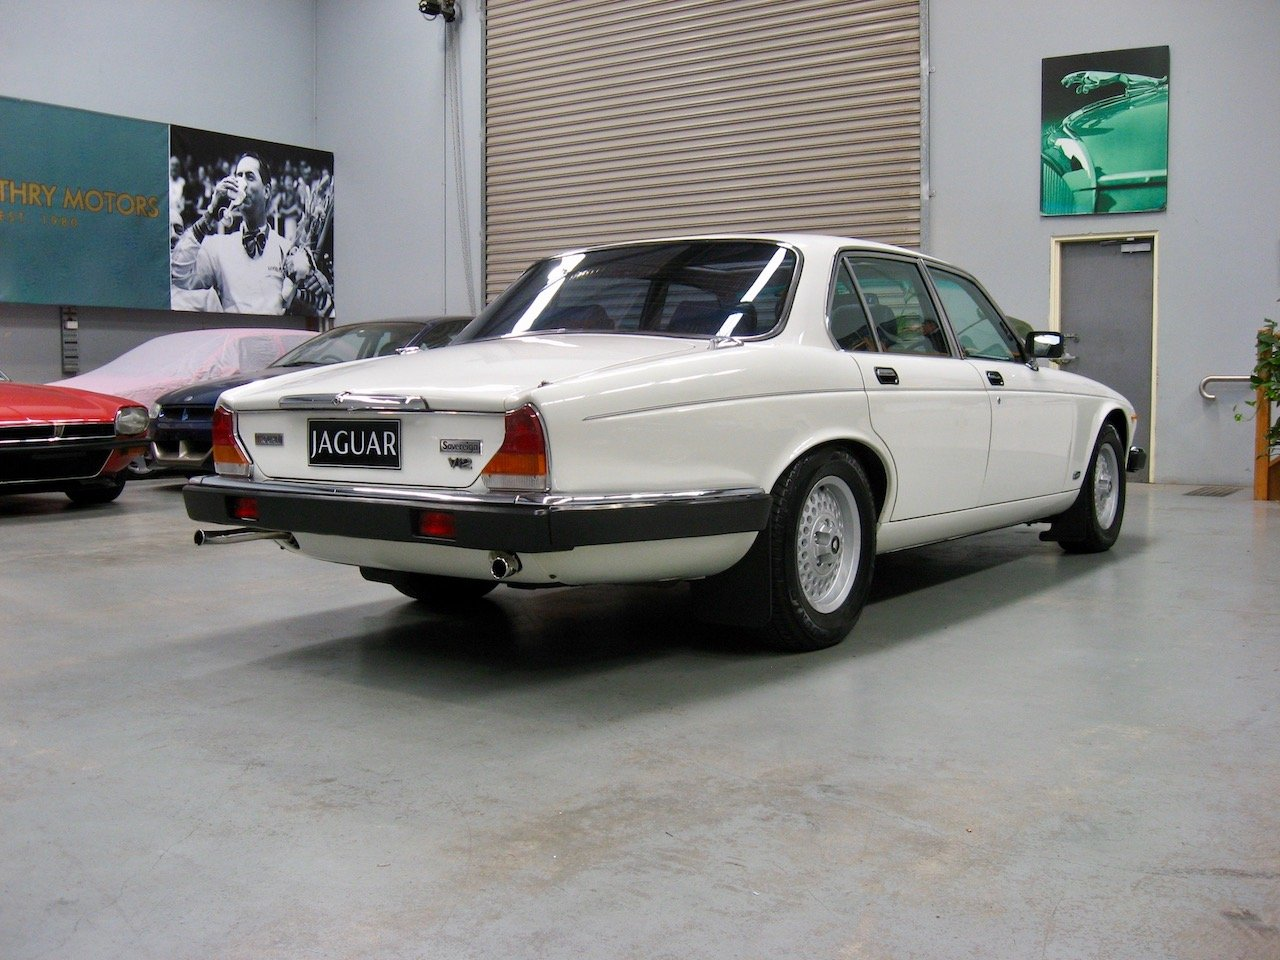 1988 Jaguar XJ12 Series 3 V12 Sovereign For Sale (picture 3 of 6)